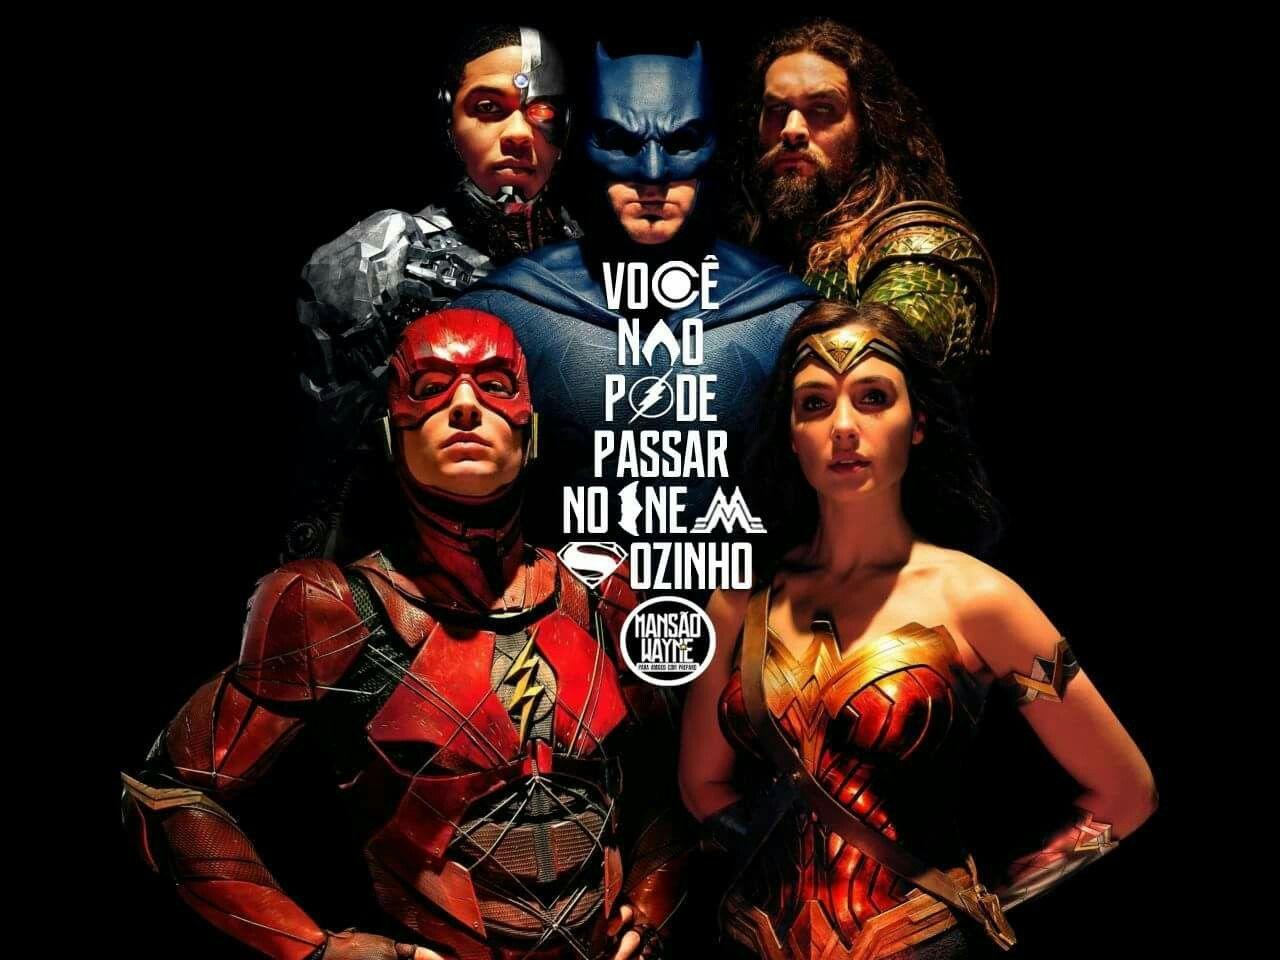 Justiça Fotos de super herois, Wonder woman, Super herói